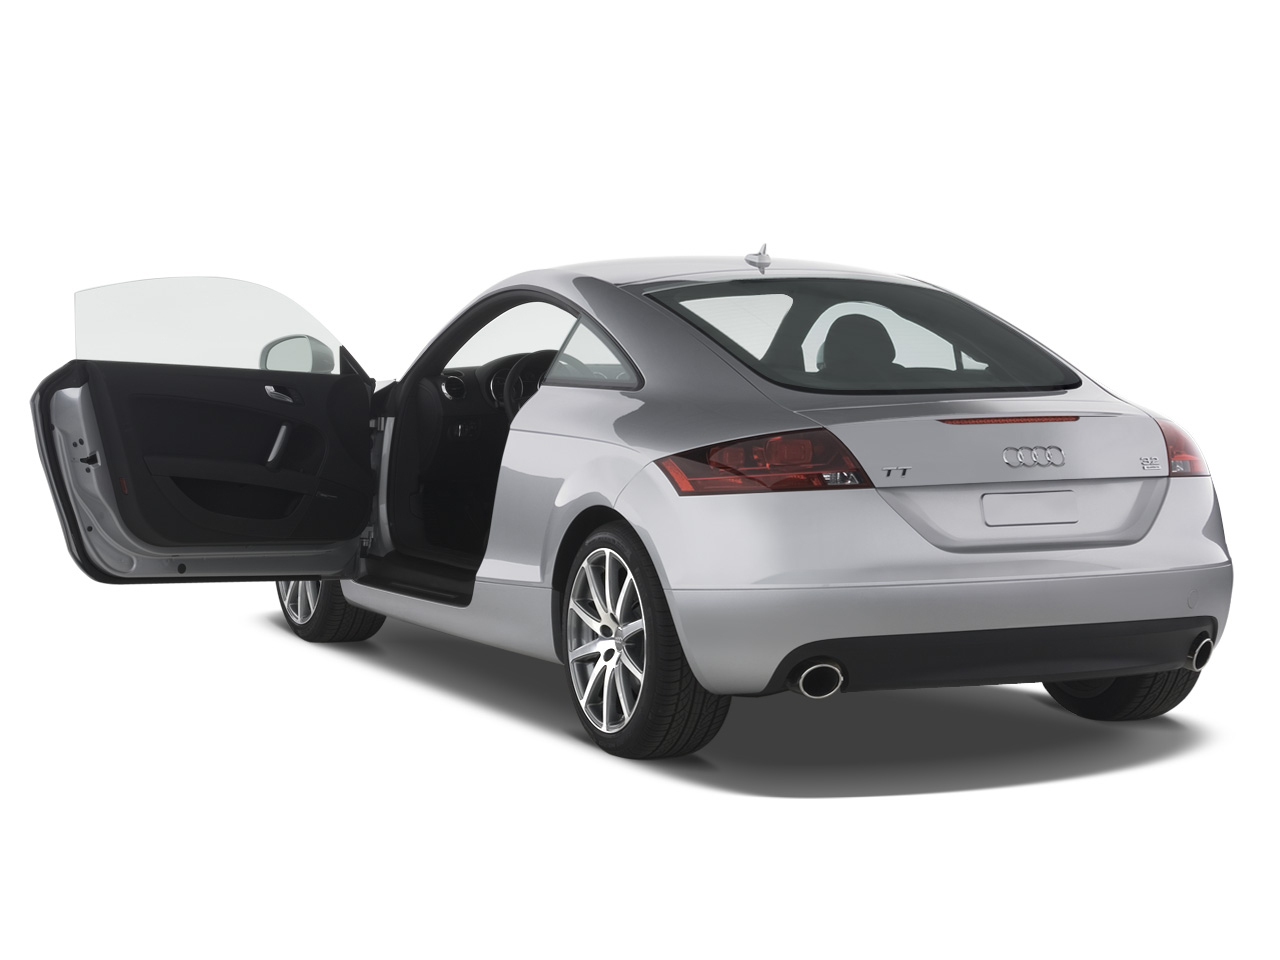 2009 audi tts roadster audi convertible sport coupe review automobile magazine. Black Bedroom Furniture Sets. Home Design Ideas